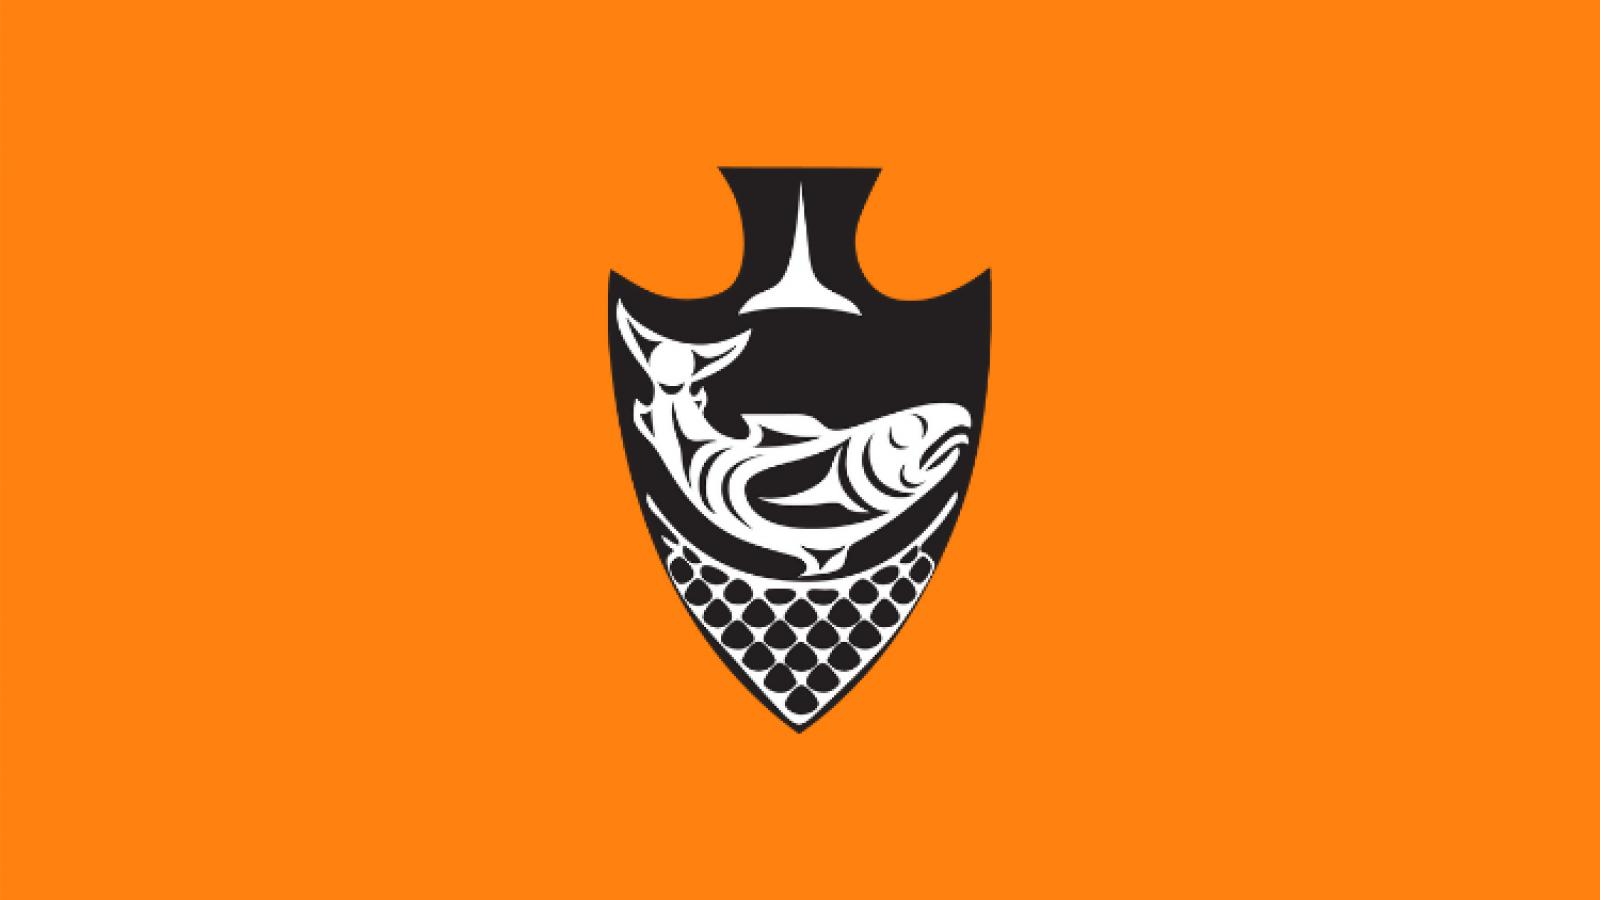 Musqueam arrowhead logo with orange background